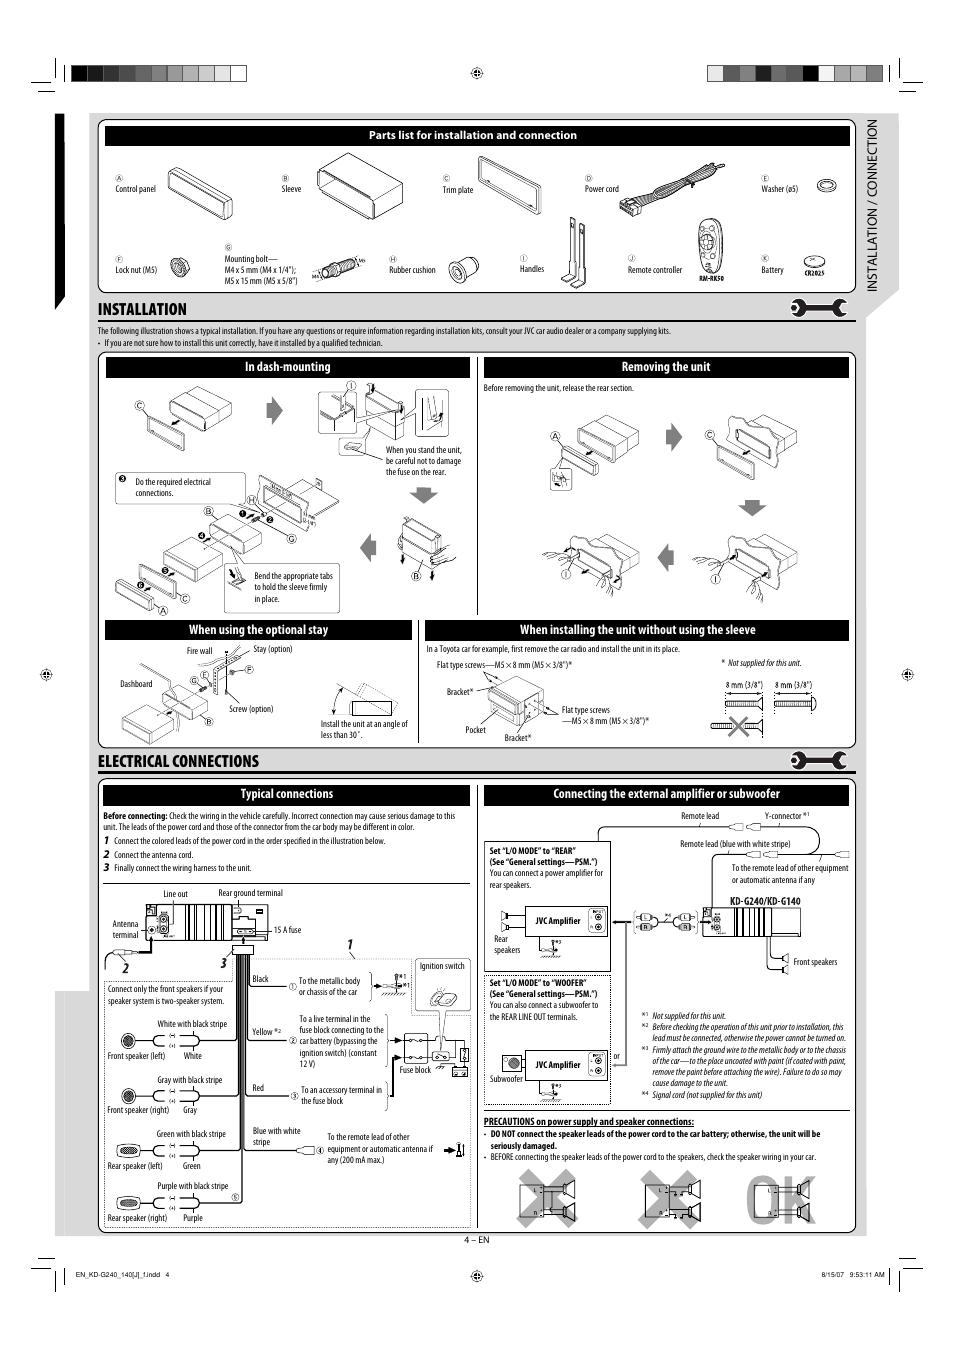 fuse box for ford econoline van wiring liry f fuel pump